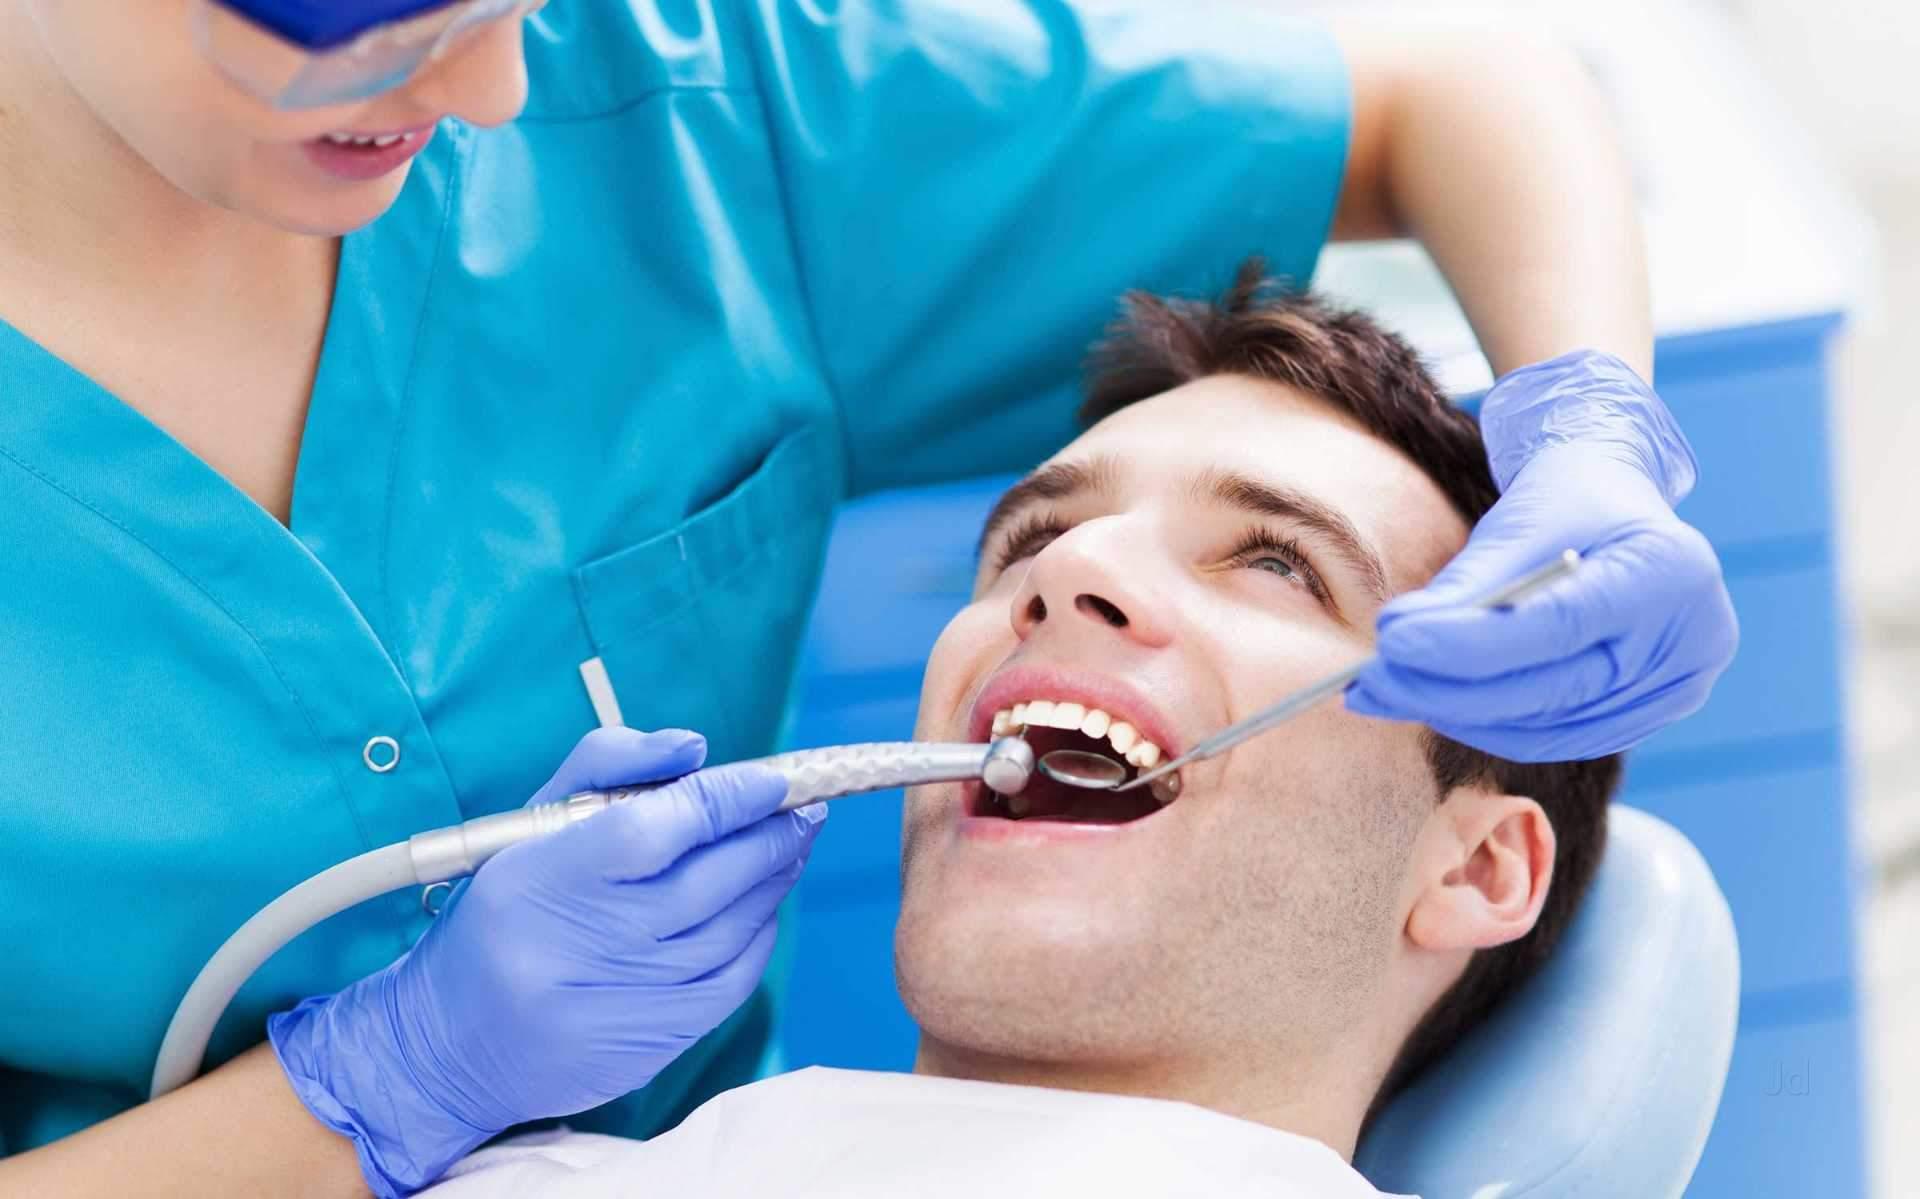 deepak-dental-clinic-agra-chowk-palwal-dentists-1wxciai38o.jpg (1920×1199)